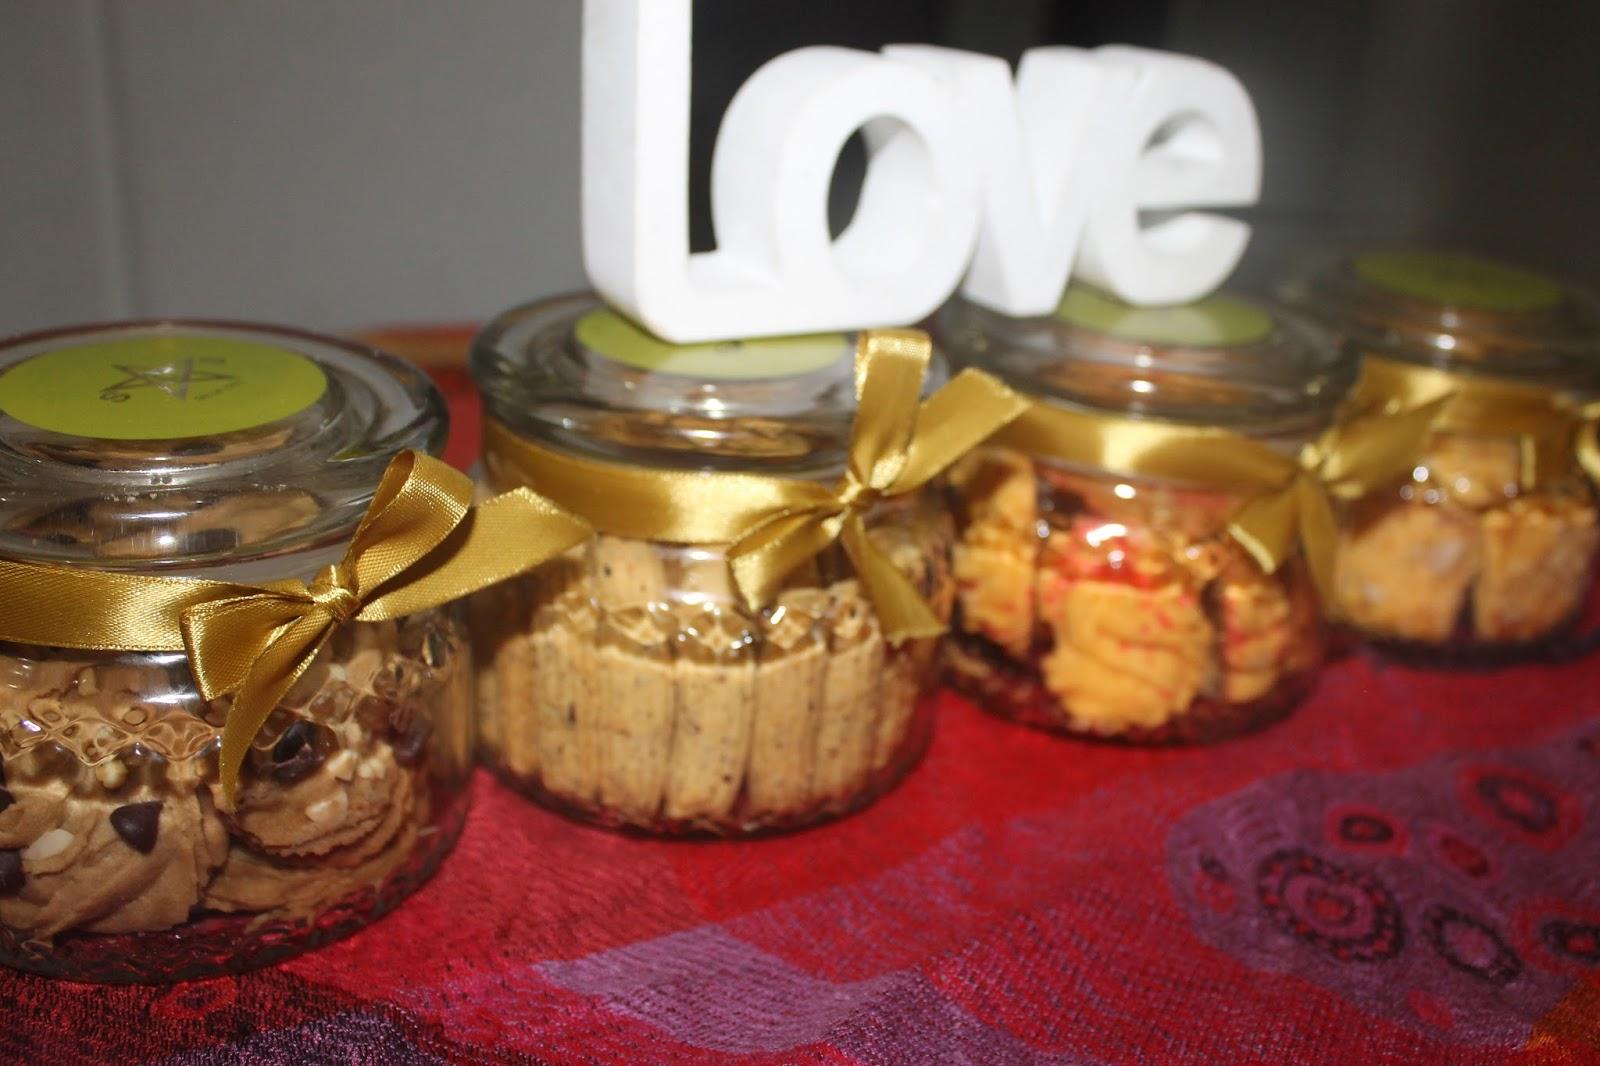 Kompilasi Resepi Biskut Semperit Cappucino, Semperit Kejutan Oren, Semperit Nutty dan Semperit